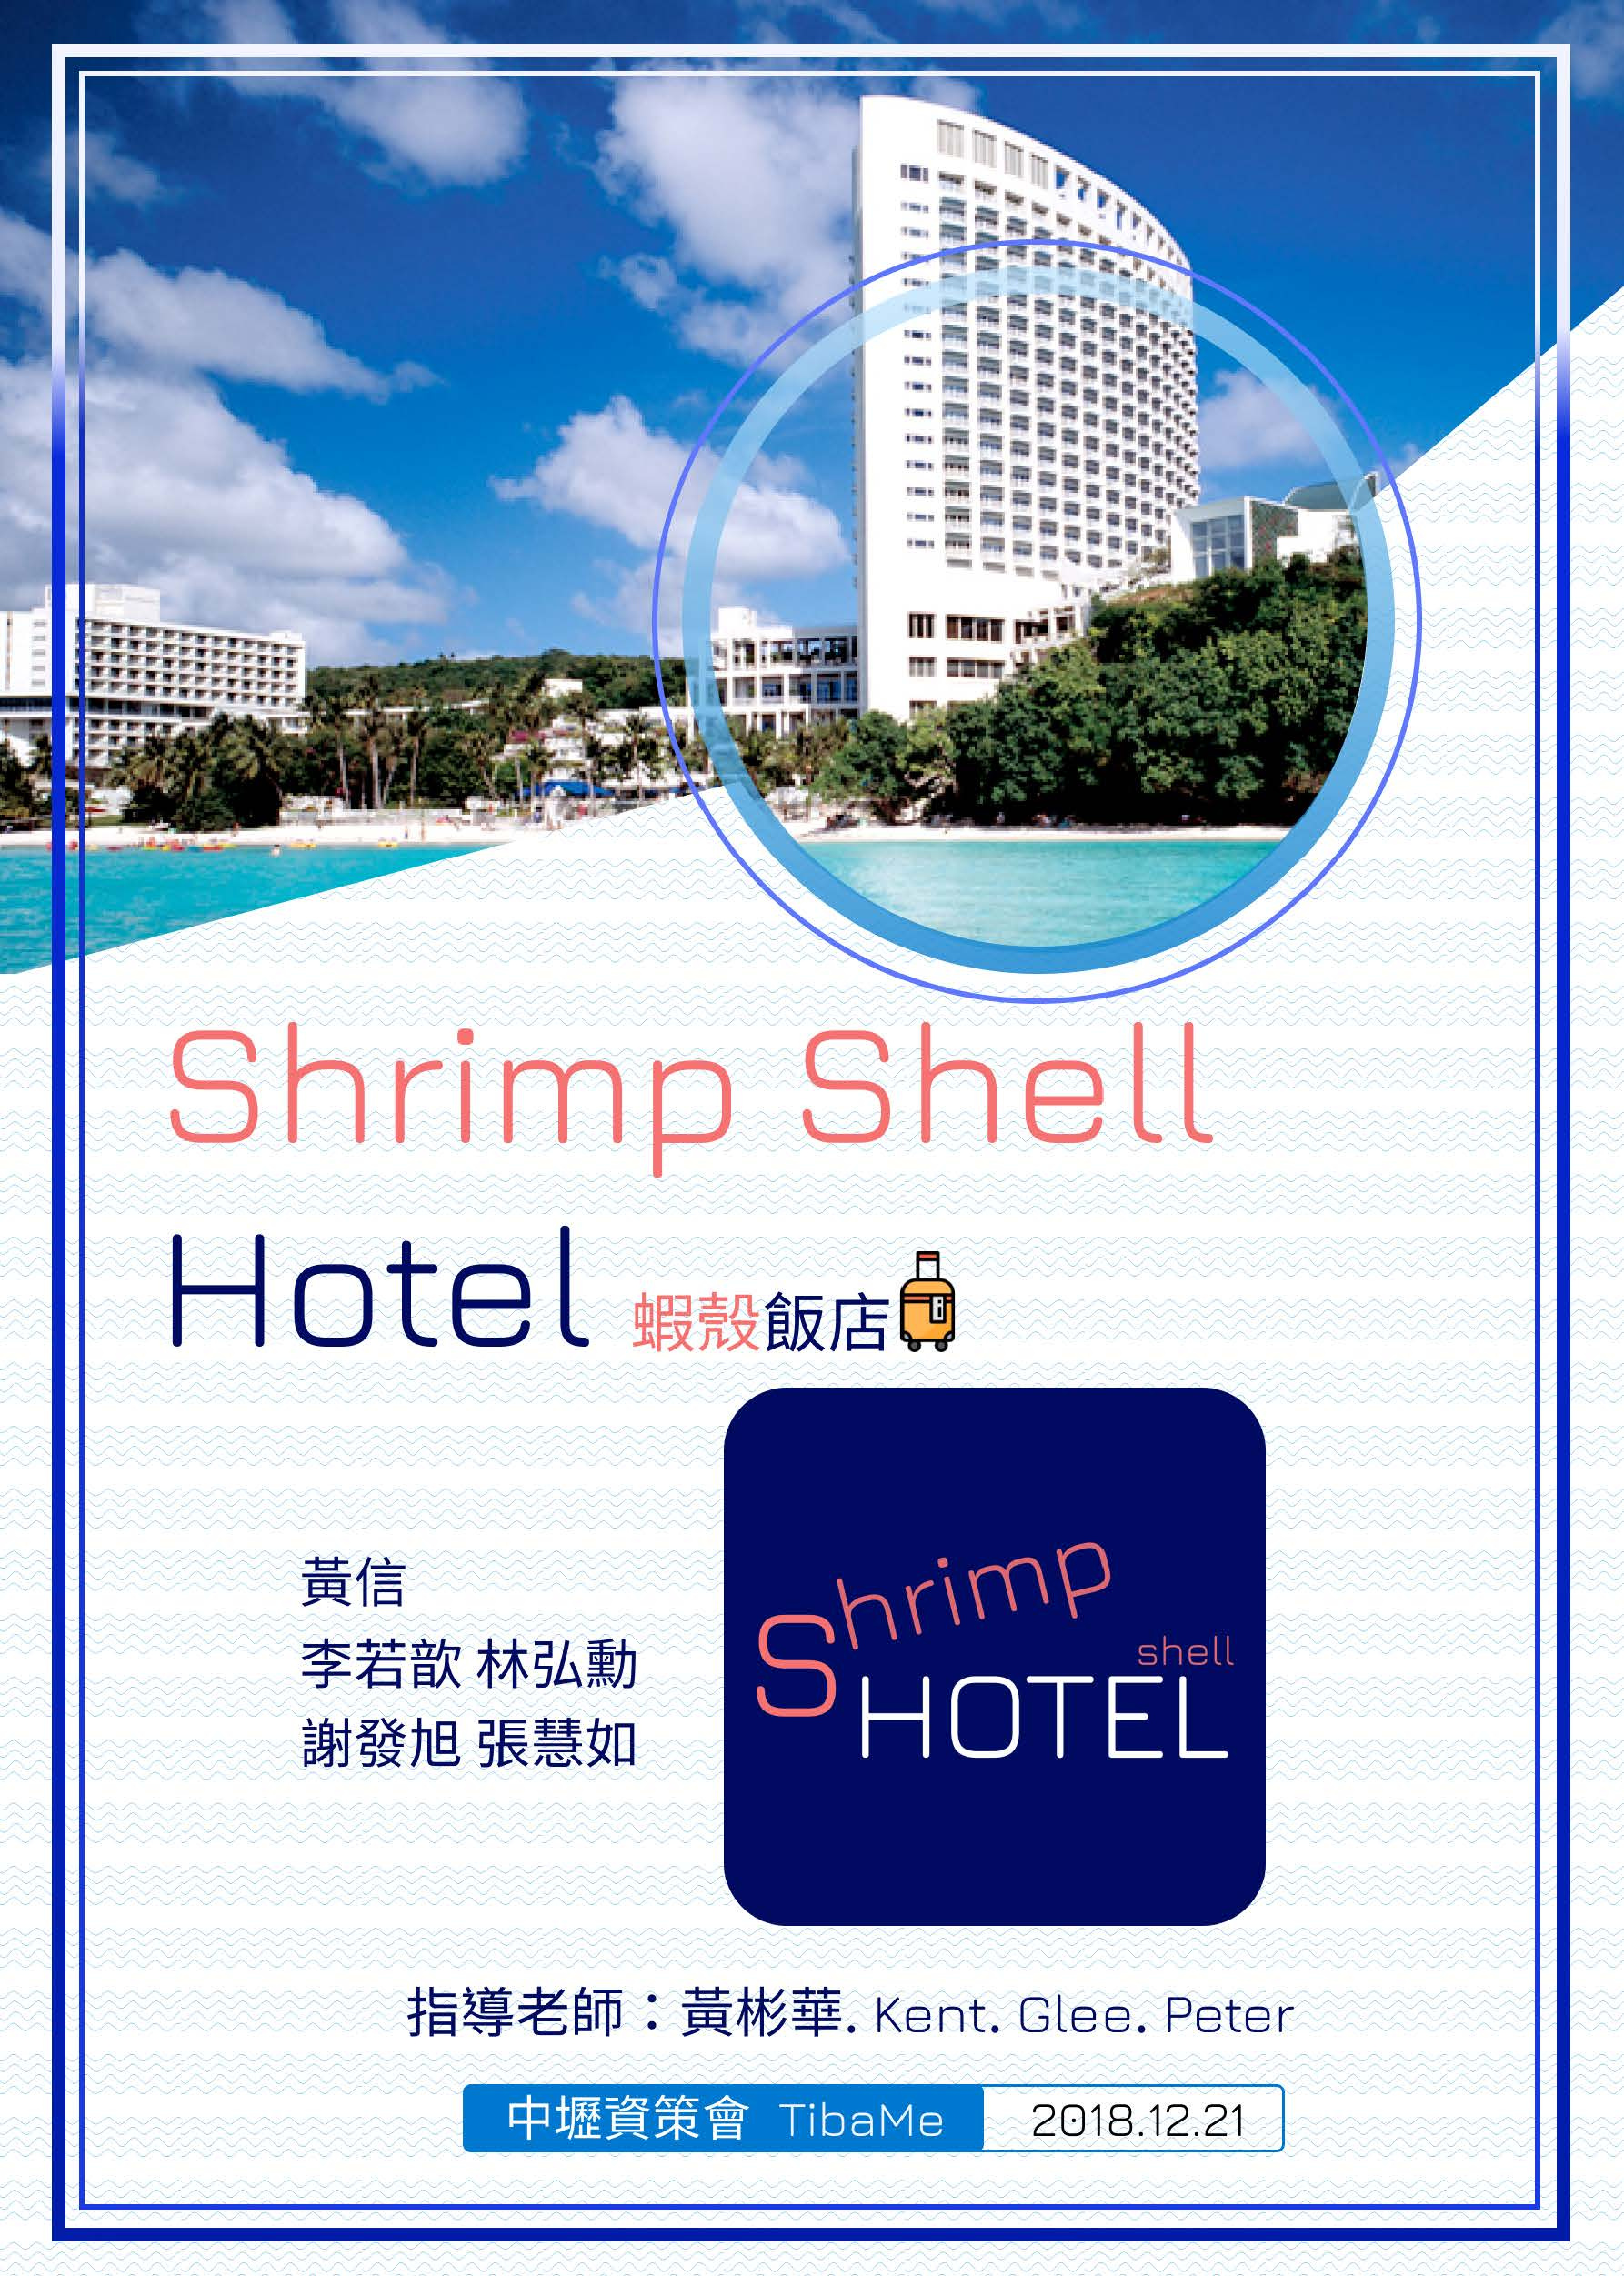 TibaMe_cp102第二組_ShrimpShellHotel(蝦殼飯店)